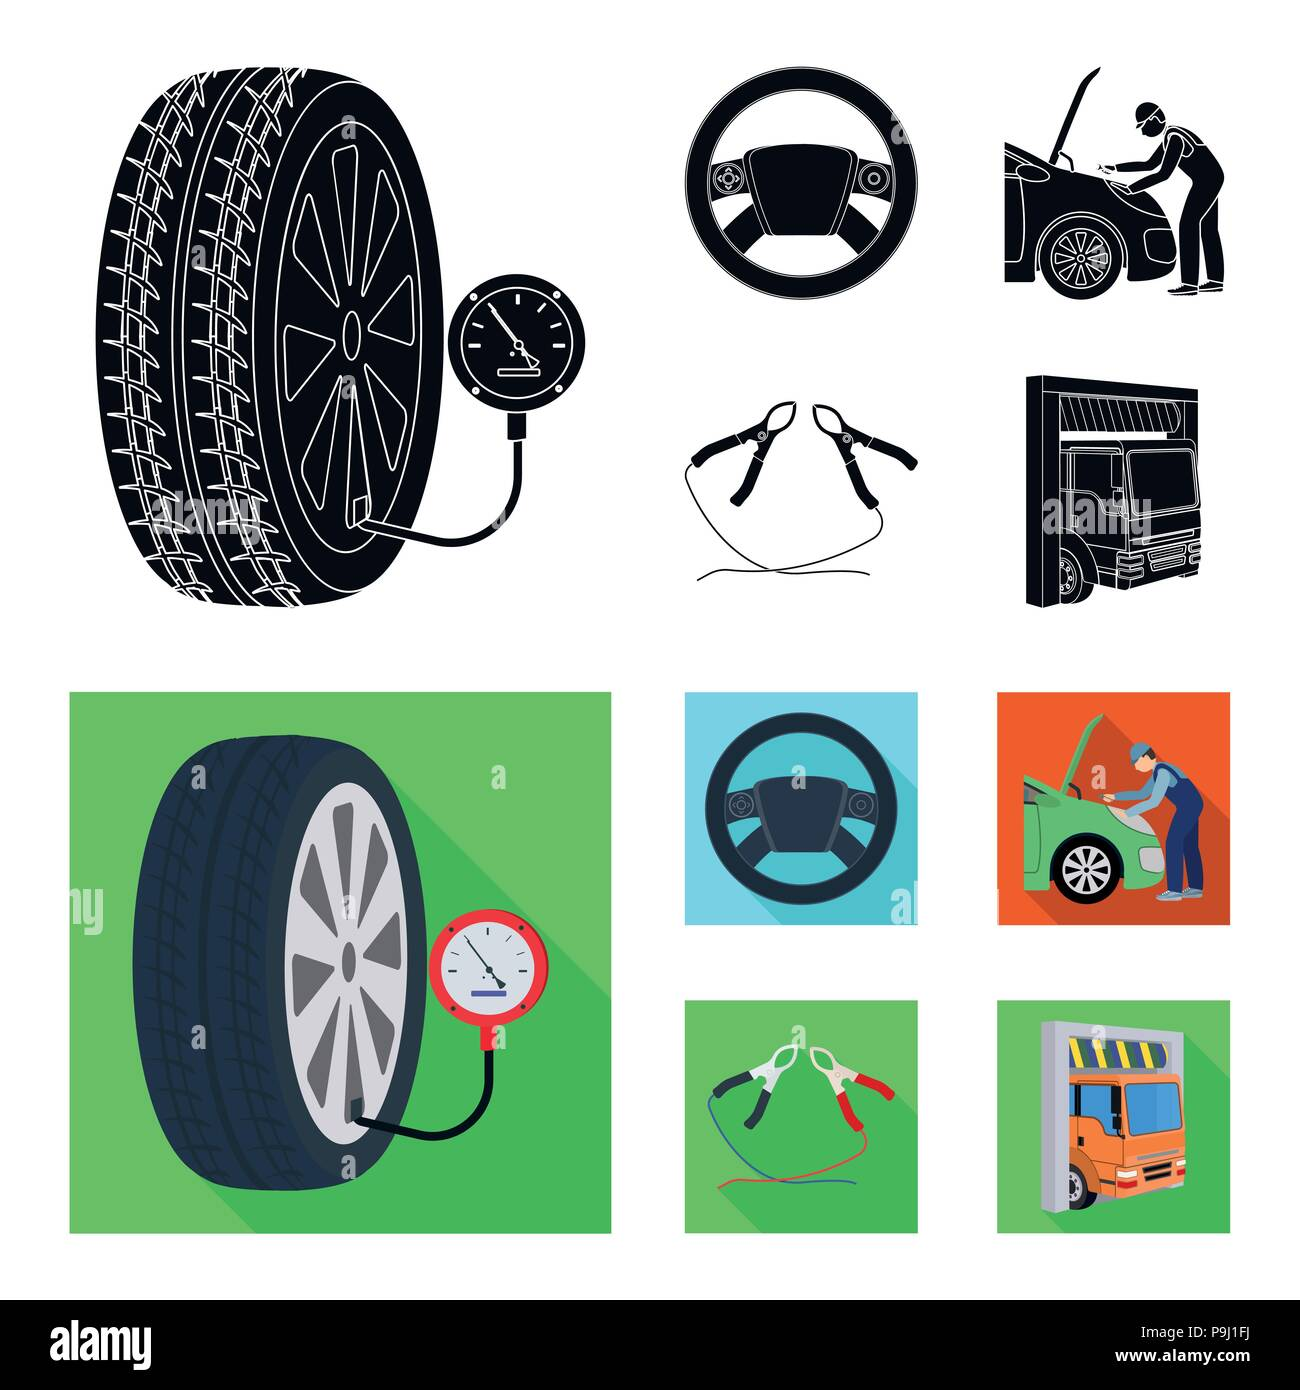 Engine Adjustment Steering Wheel Clamp And Wheel Black Flat Icons